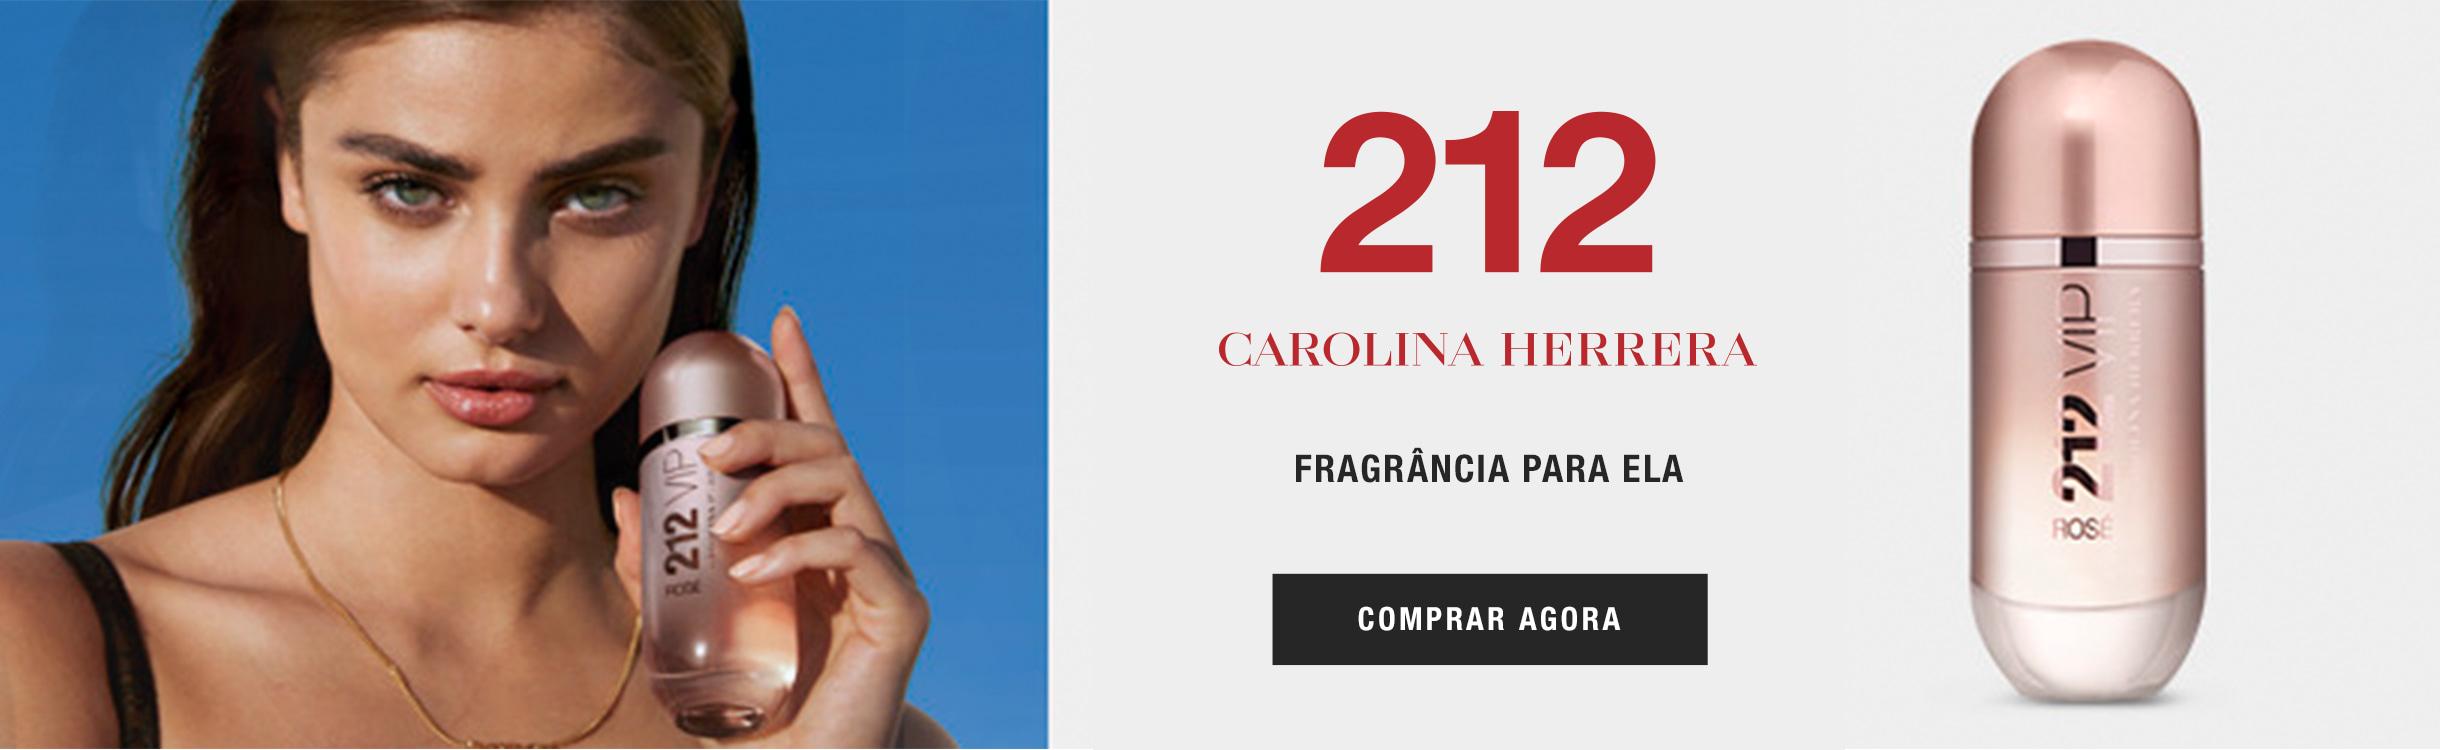 Carolina herrera/Perfumes e Perfumaria/Feminino/Desodorante